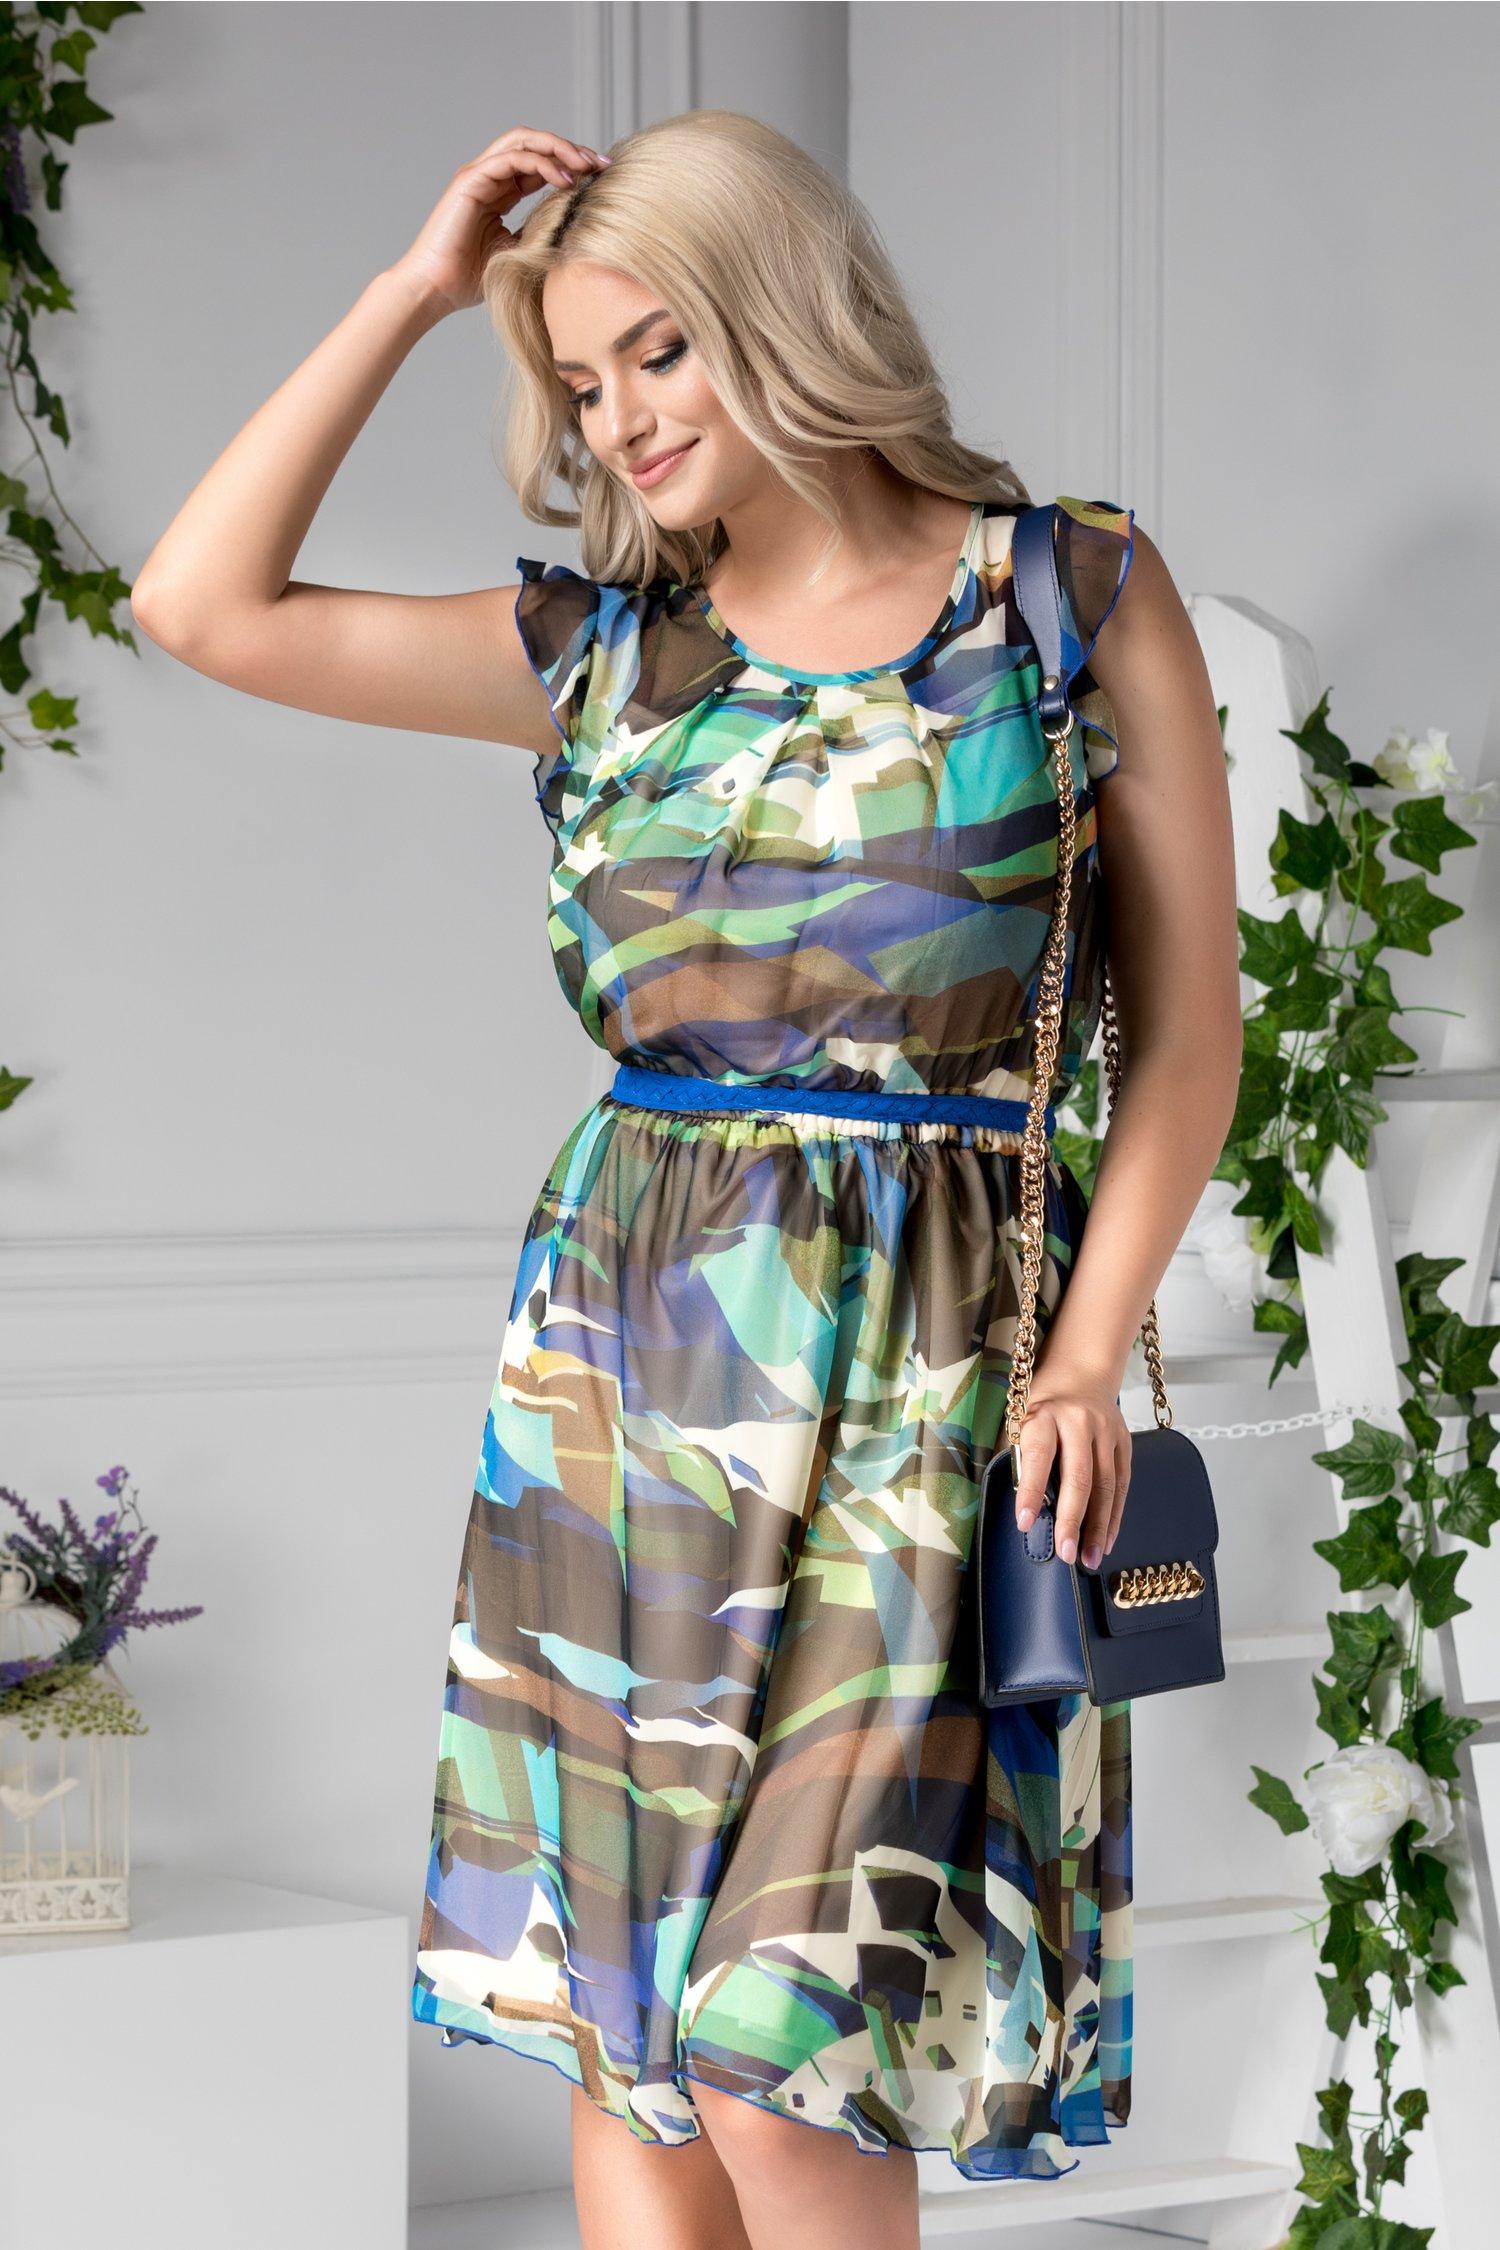 Rochie Anisia de zi cu imprimeu divers colorat